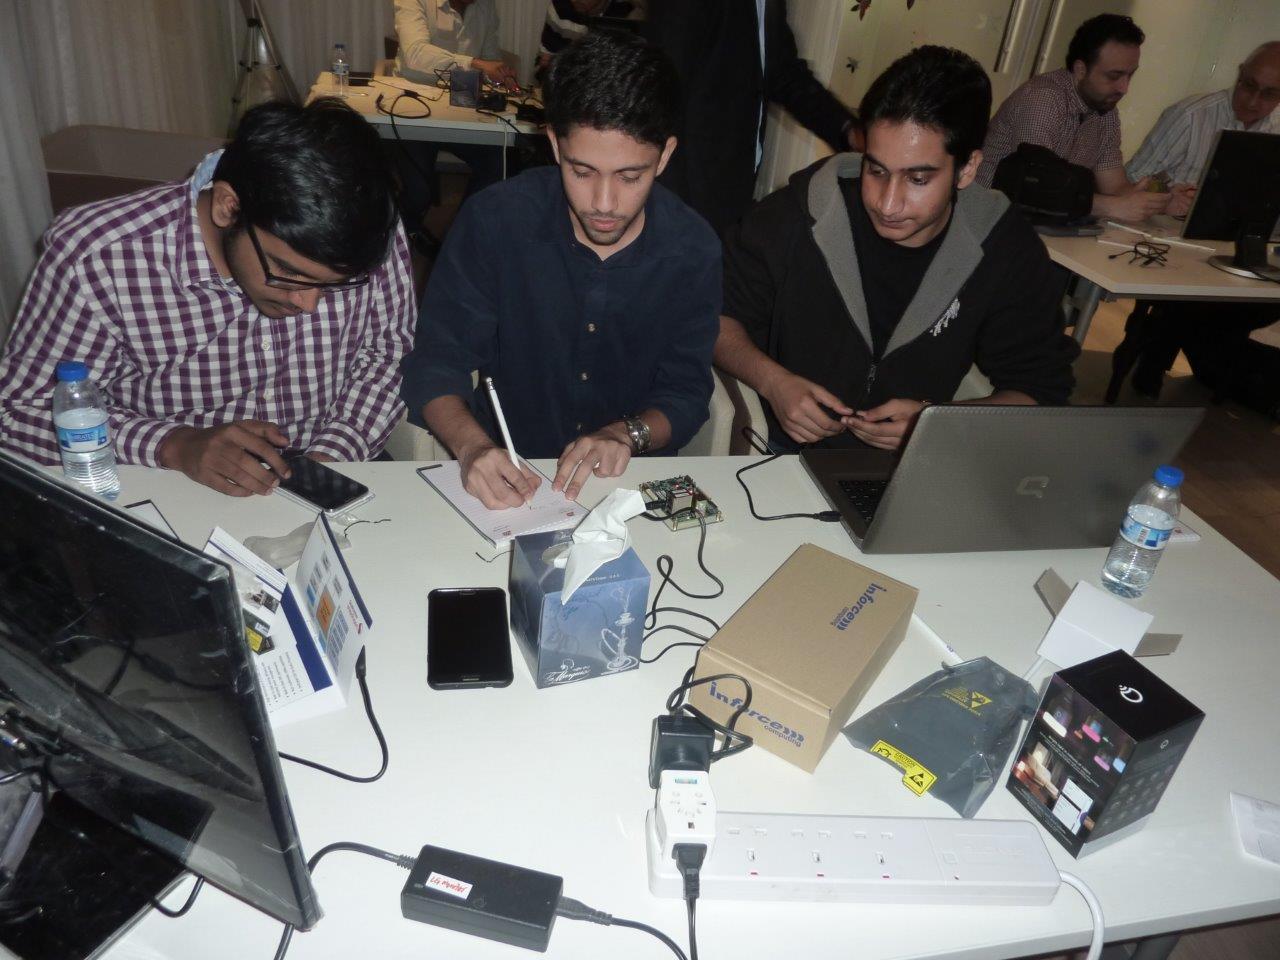 ioT Workshop – Dec 14 2014